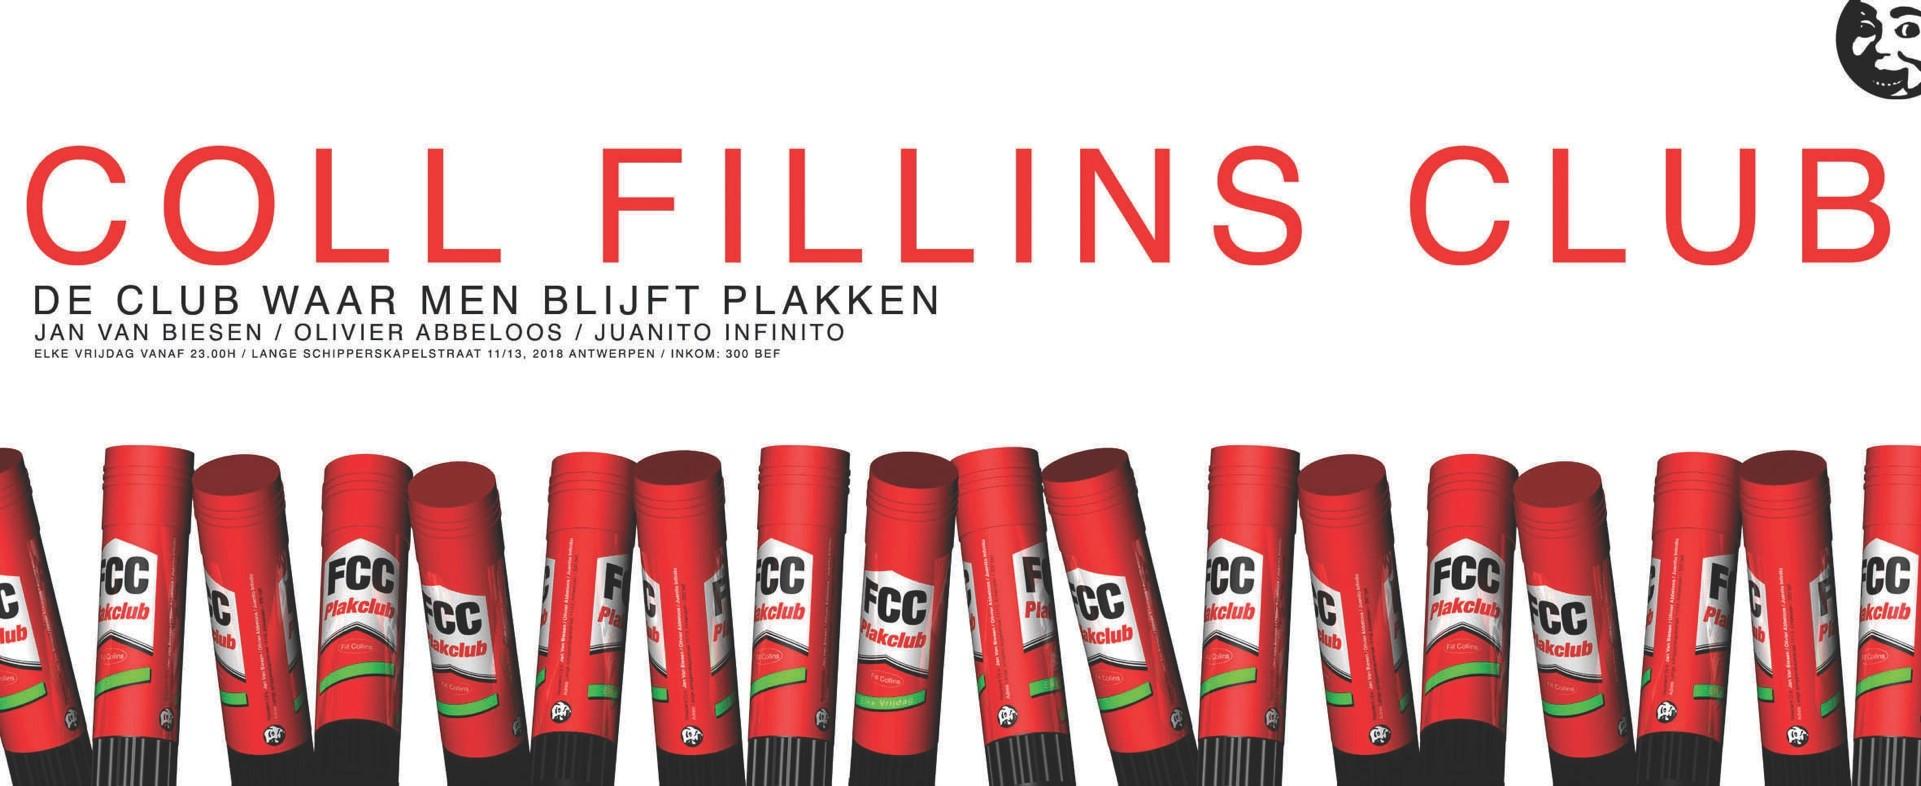 Coll Fillins